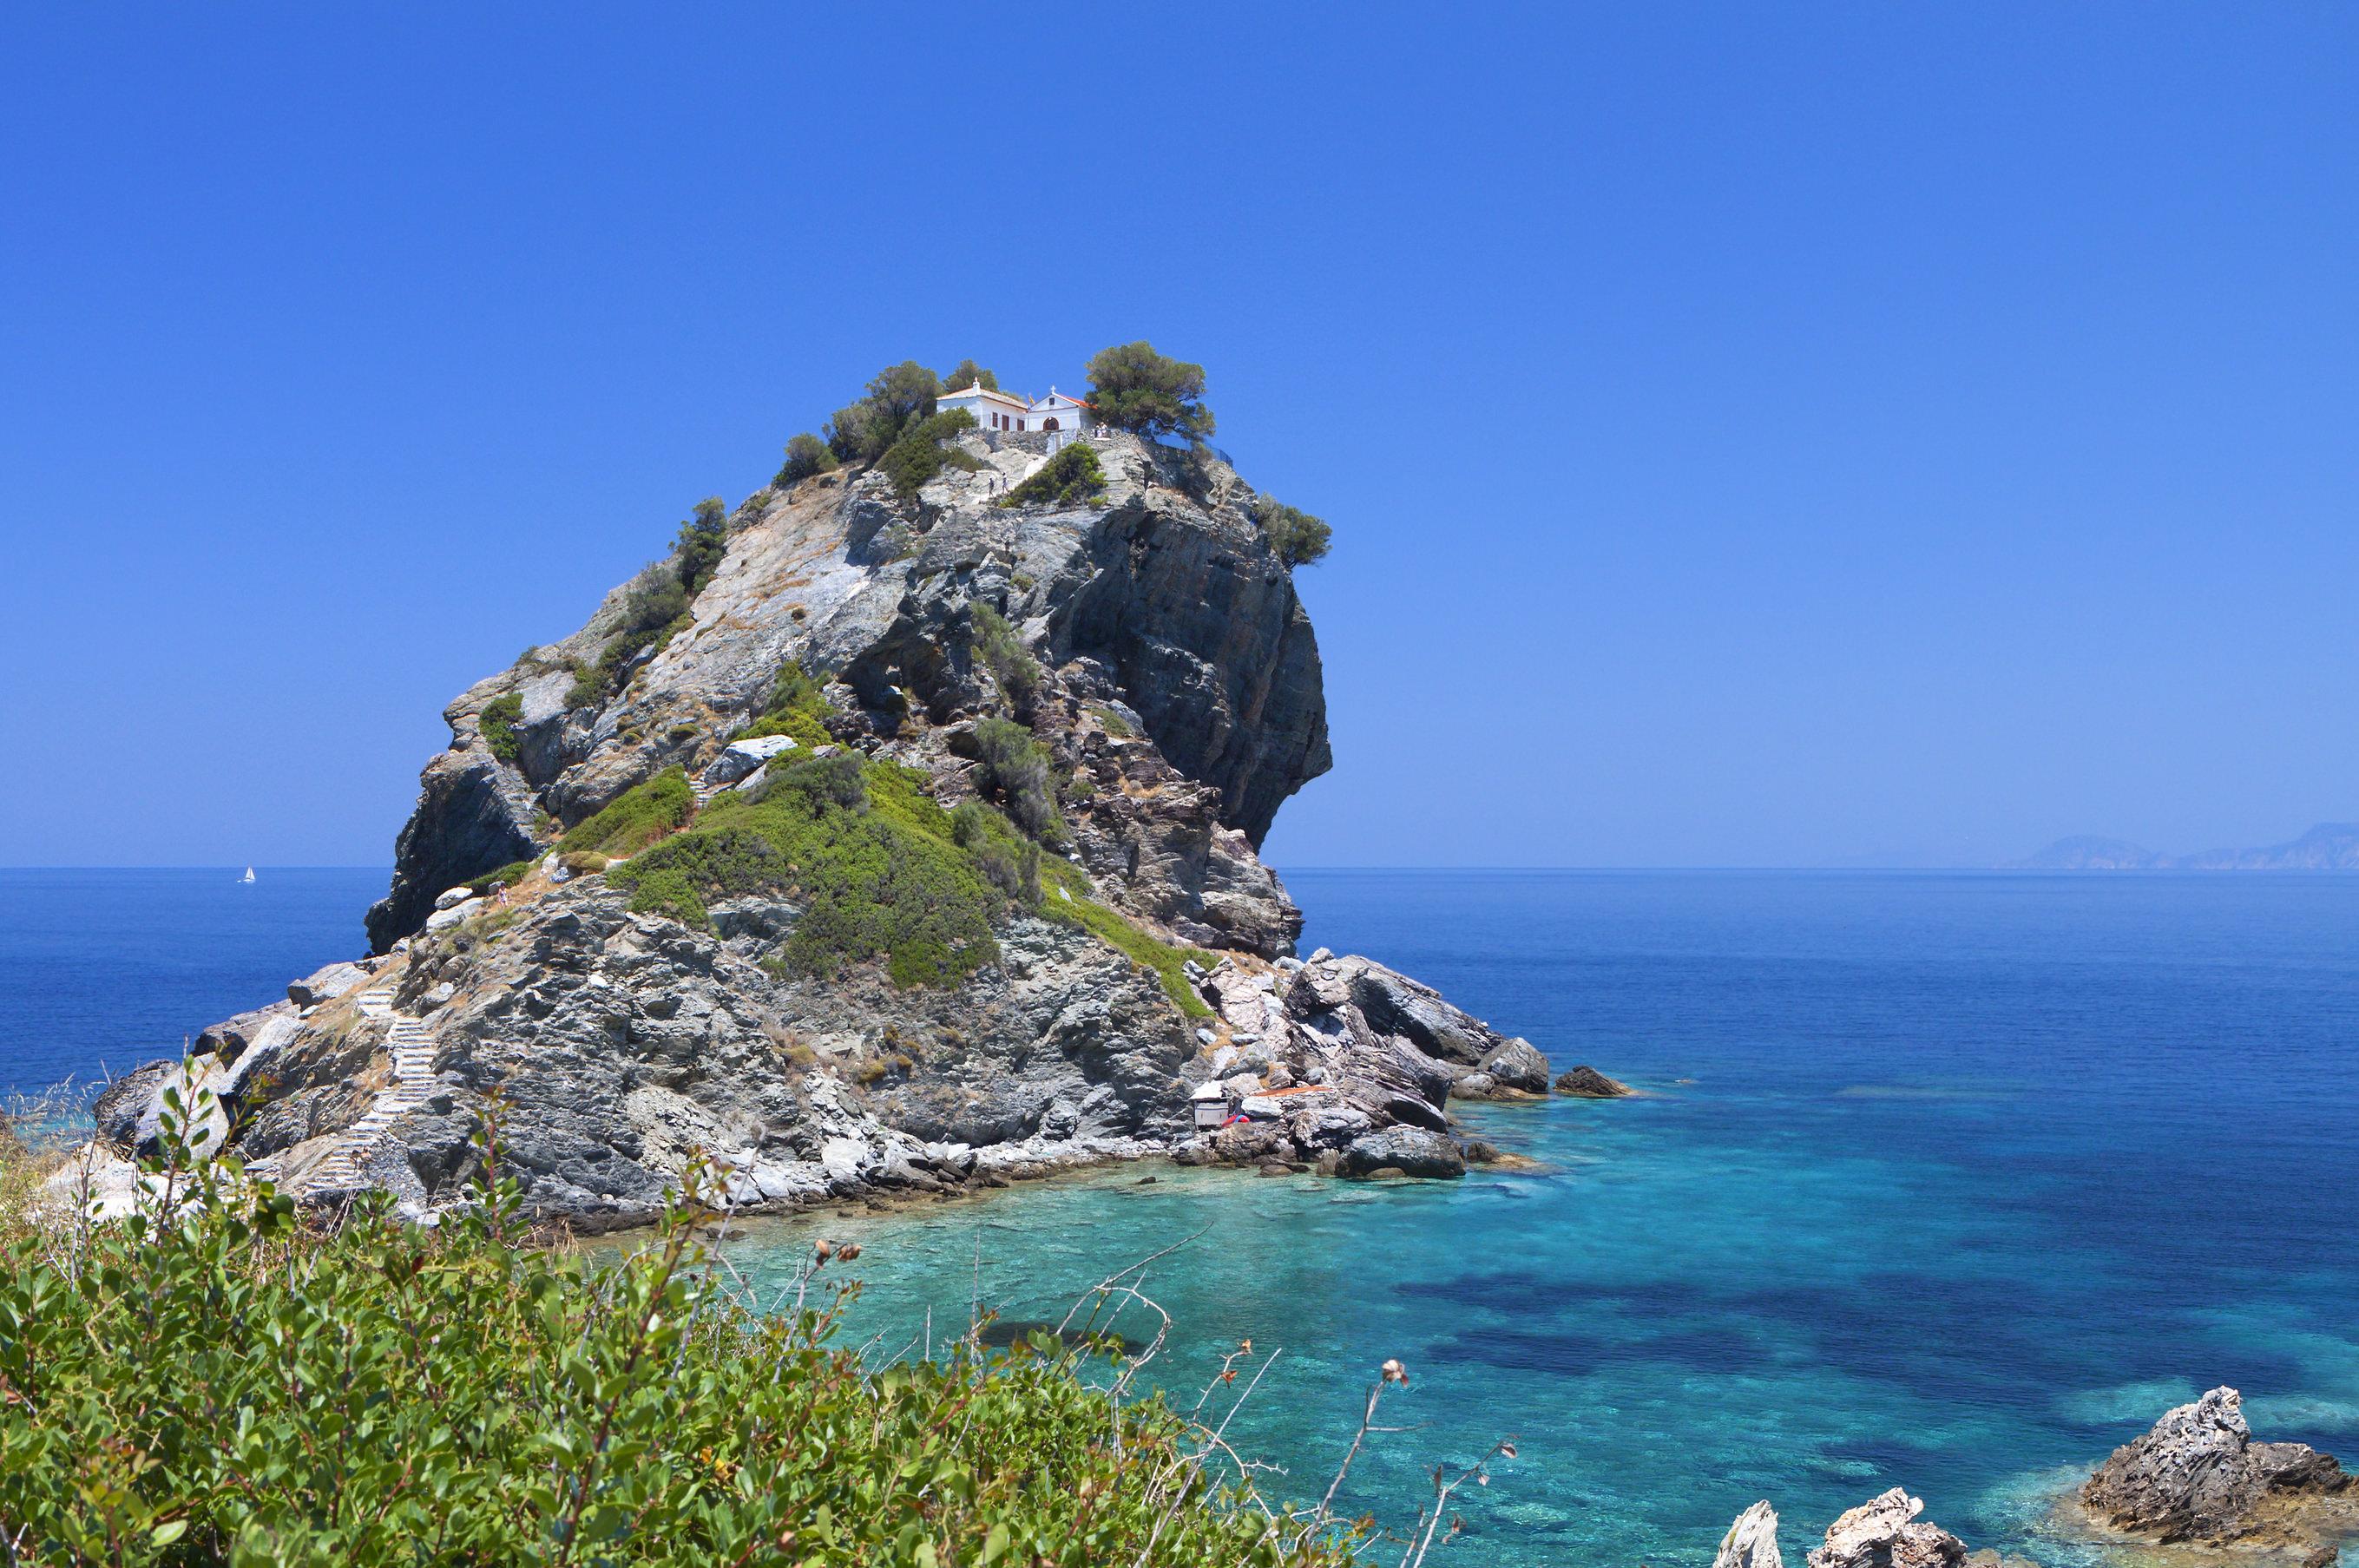 Agios Ioannis chapel at Skopelos island in Greece